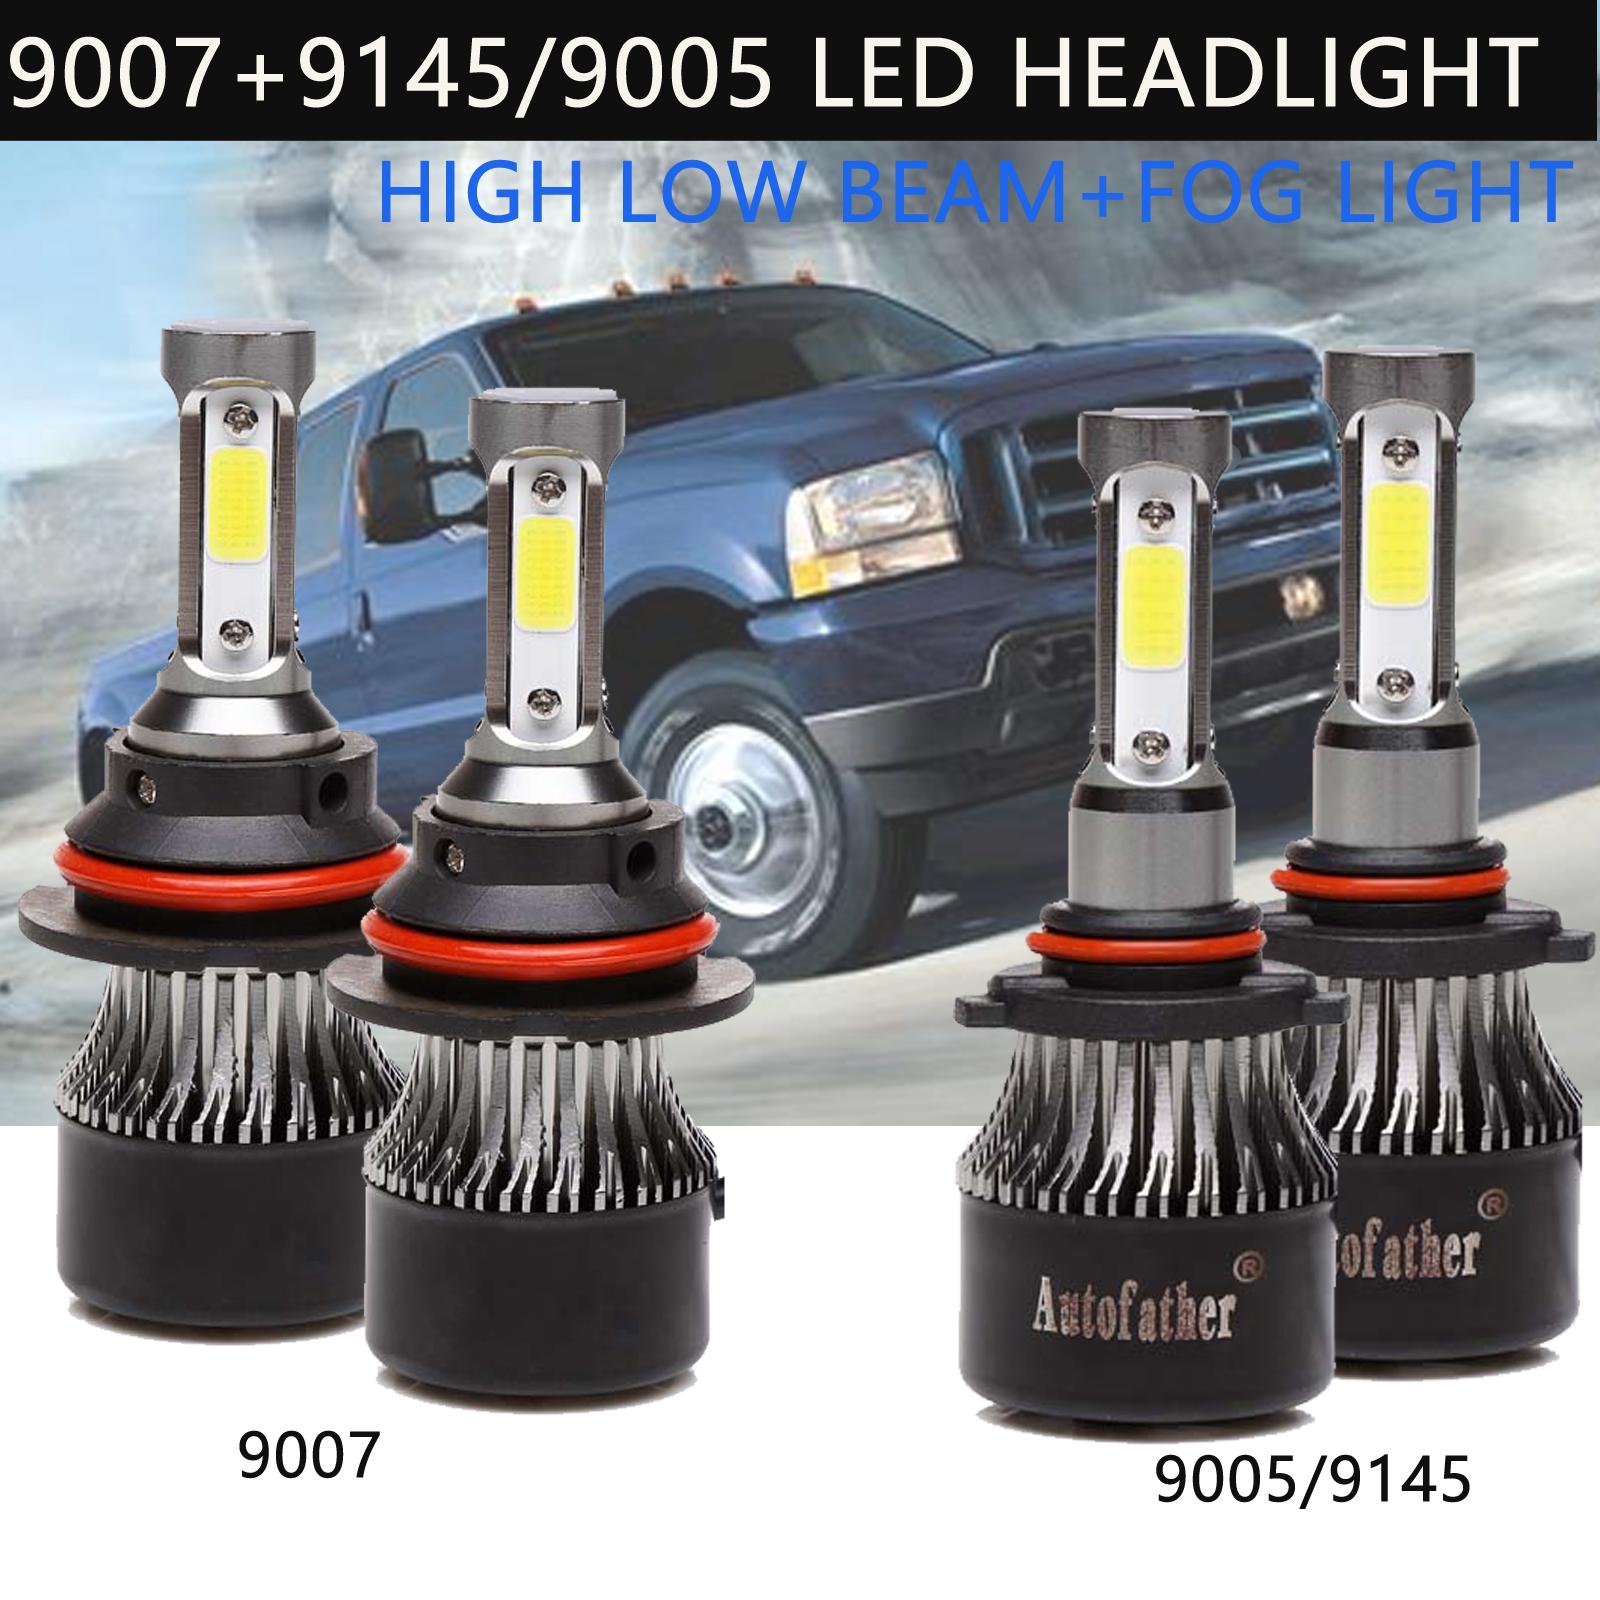 9007 9145 9140 LED Headlight for Ford F-250 F-350 Super Duty 2001-2004 Fog Light